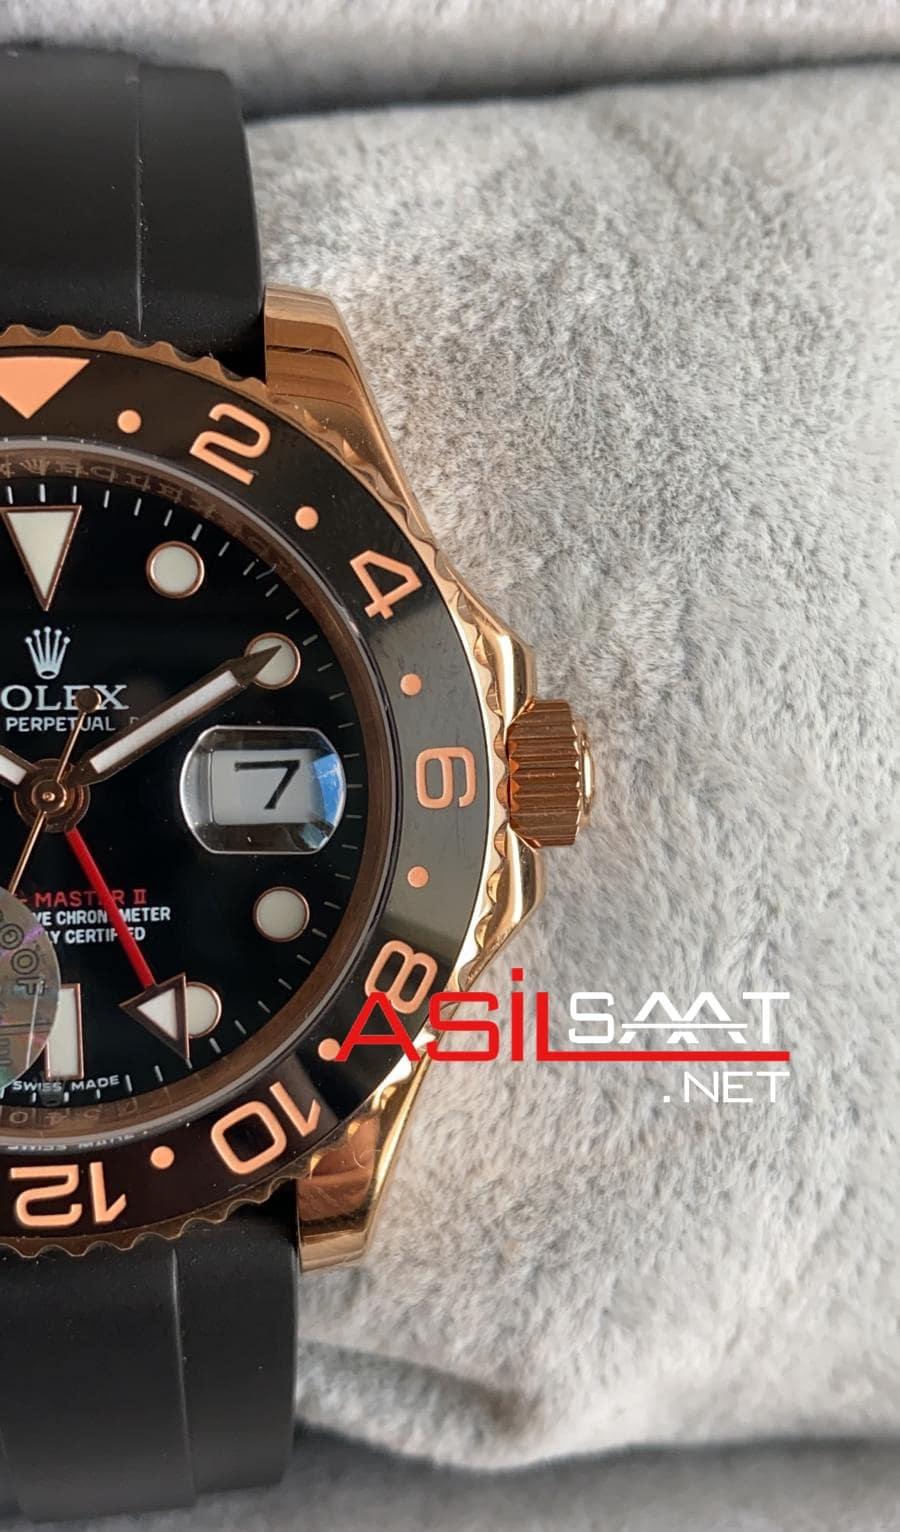 Rolex Oyster Perpetual Gmt Master II Rubber Everose Rosegold Replika Saat ROLG006